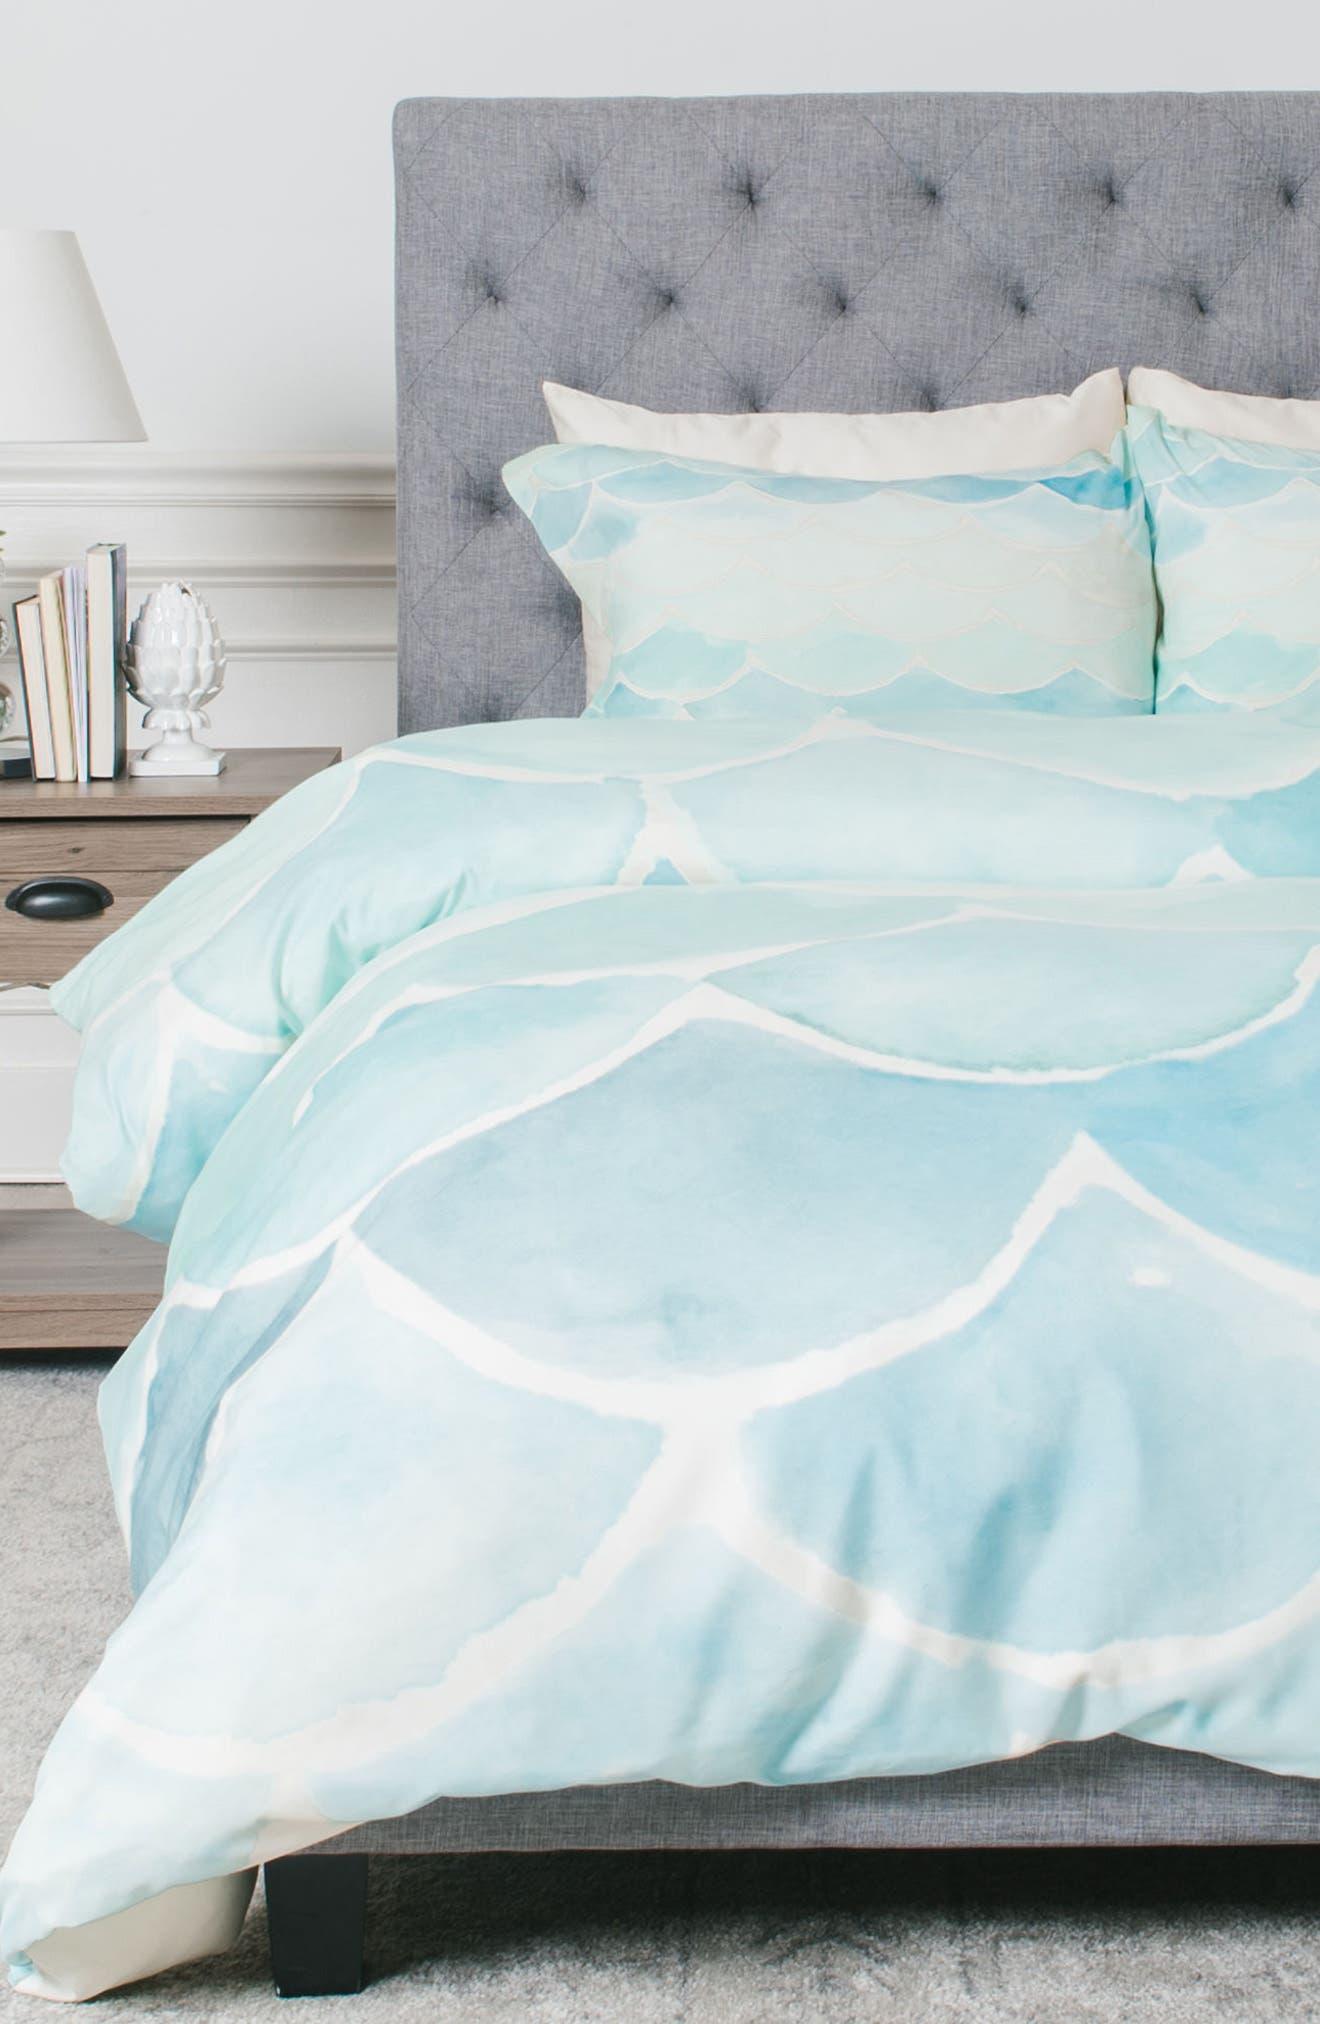 deny designs mermaid scales duvet cover  sham set  nordstrom -